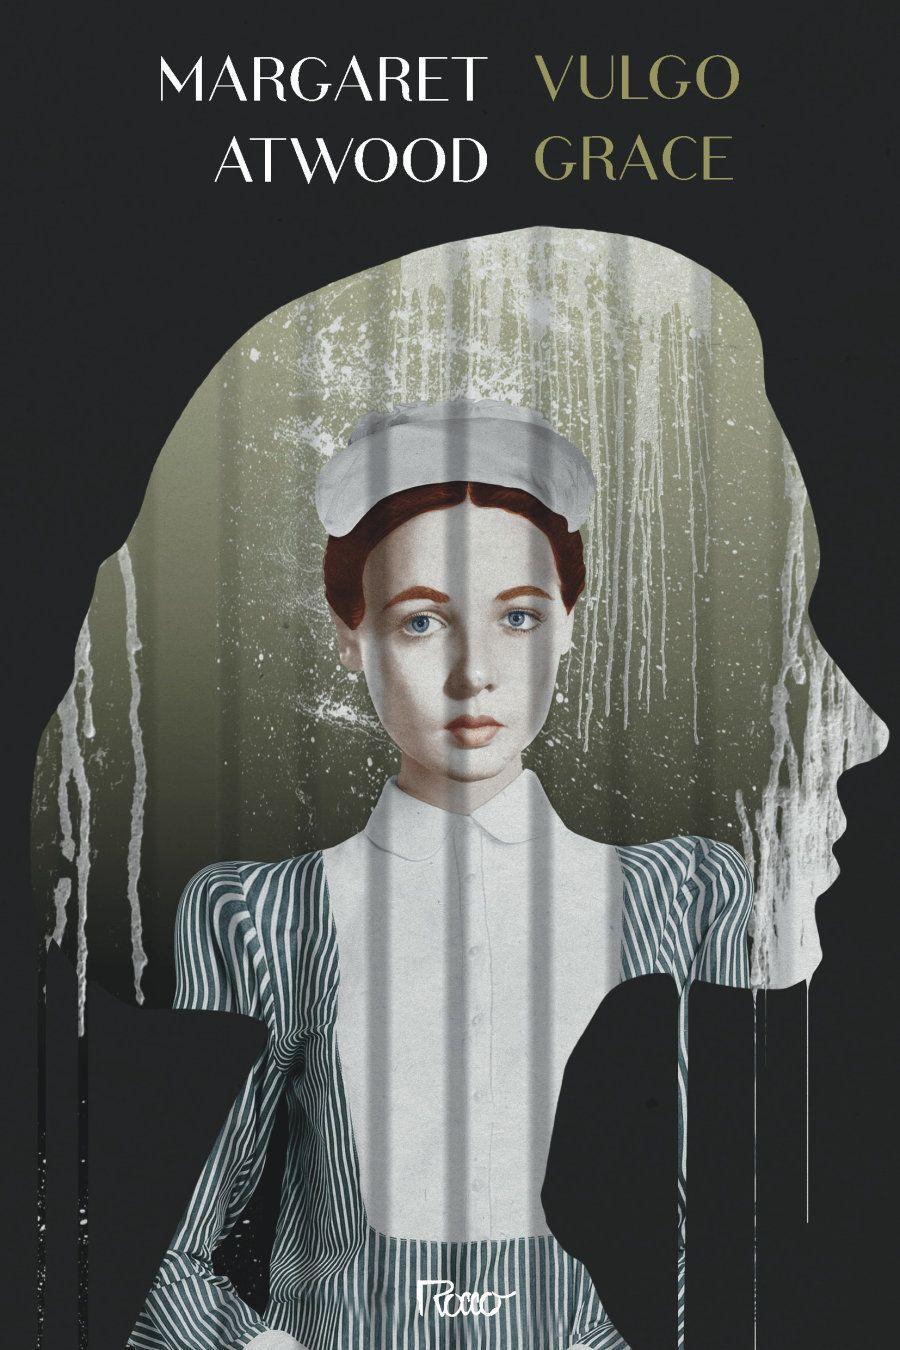 Nova capa de 'Vulgo Grace', feita por Laurindo Feliciano para a